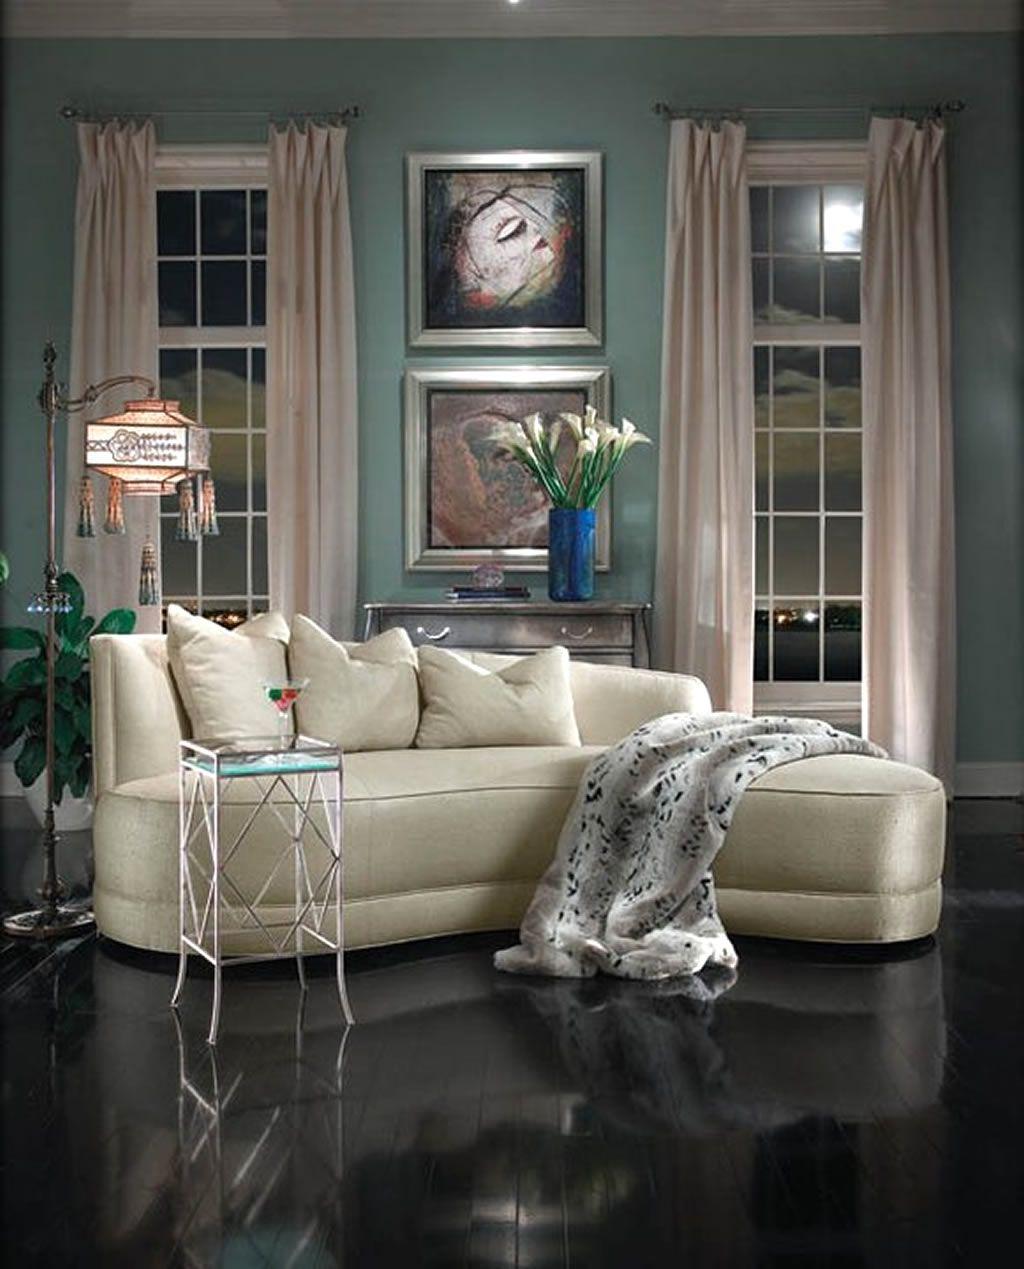 High Design Furniture: Contemporary Sofa Furniture Design By Swaim, High Point